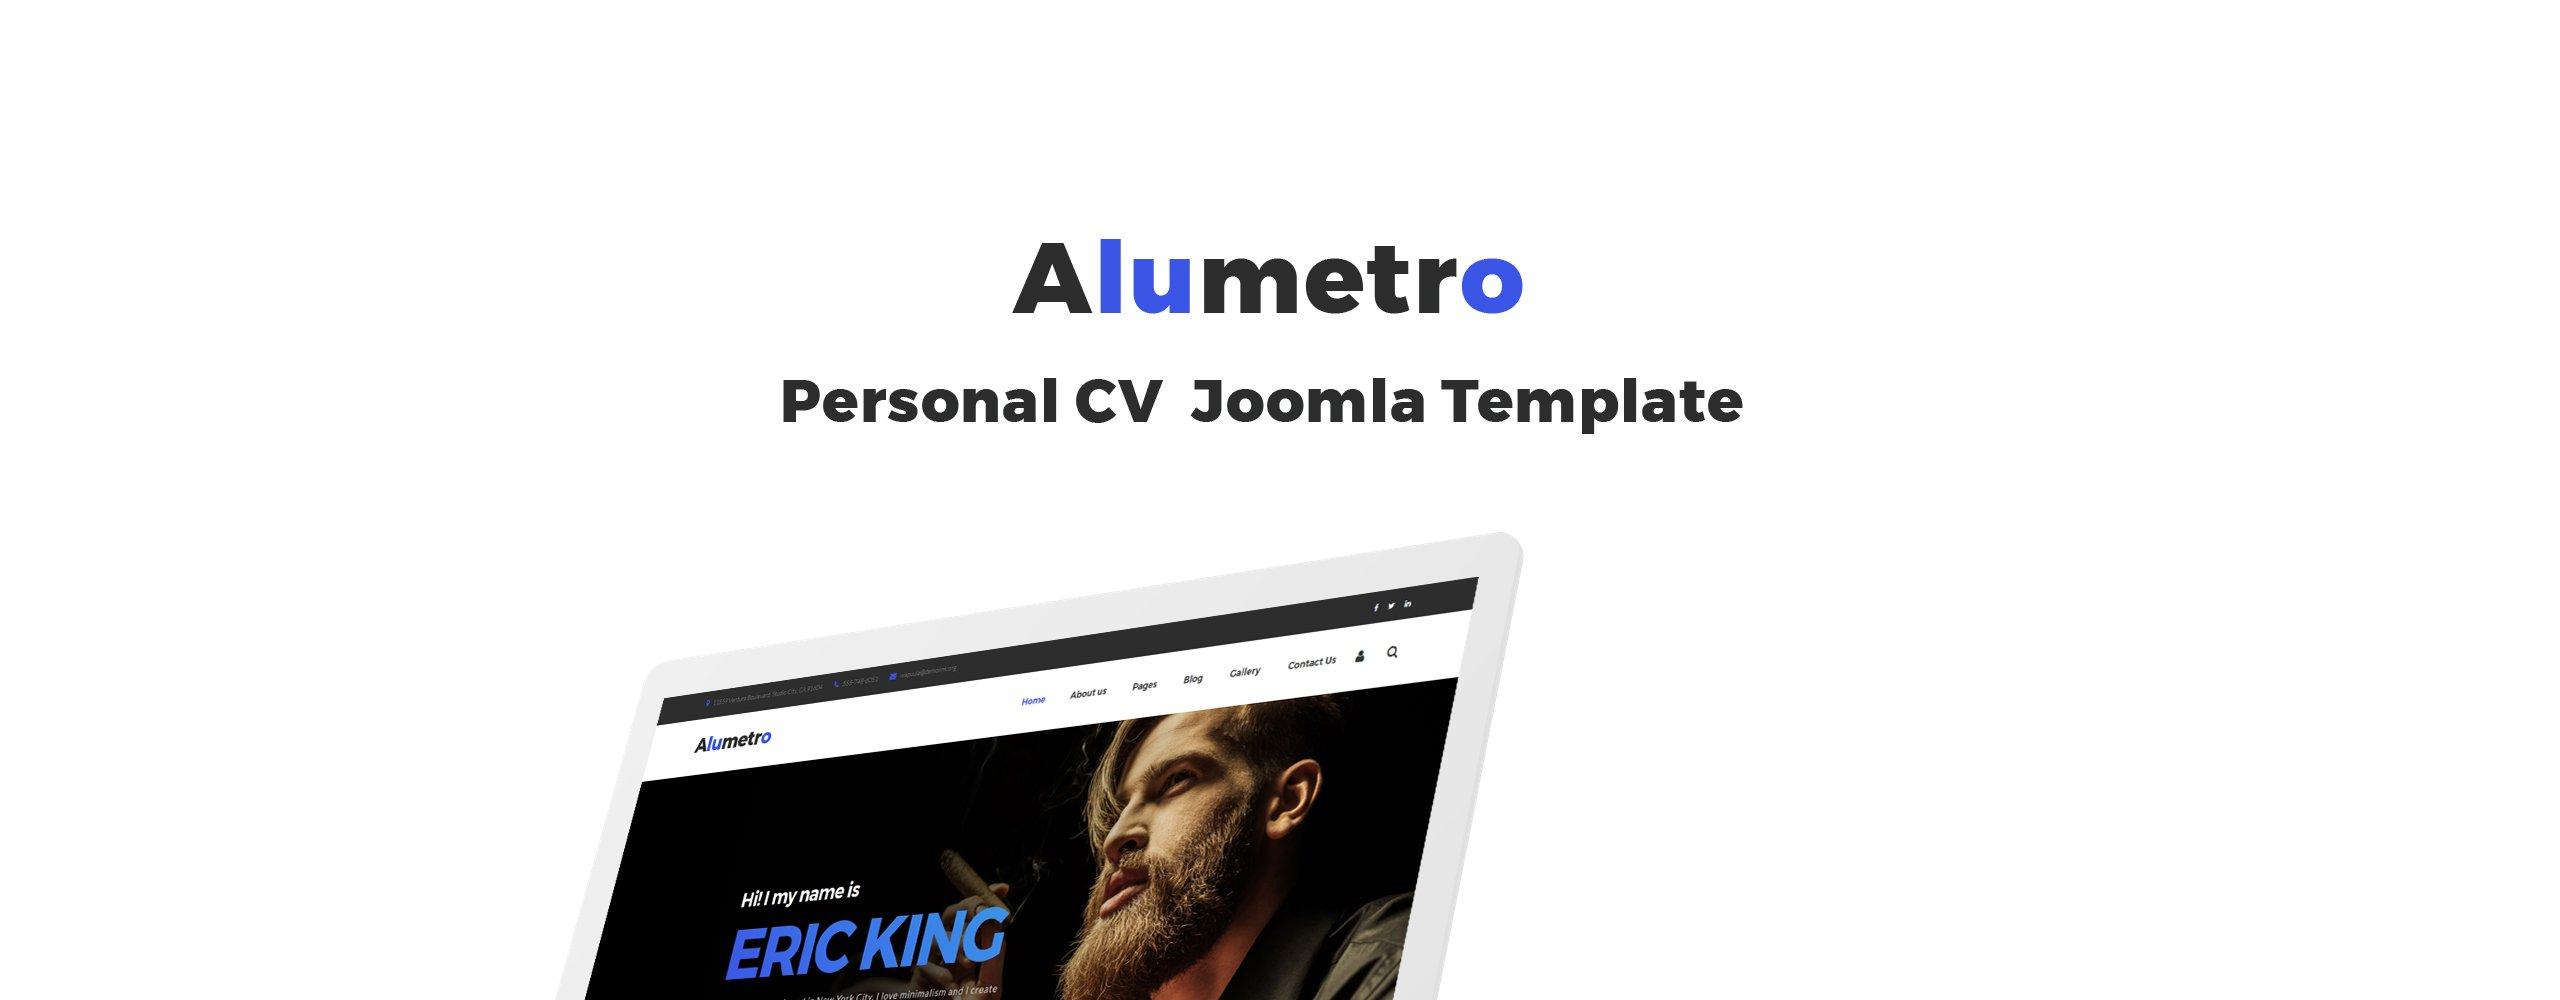 Website Design Template 70802 - post project service multipurpose responsive visual seo html